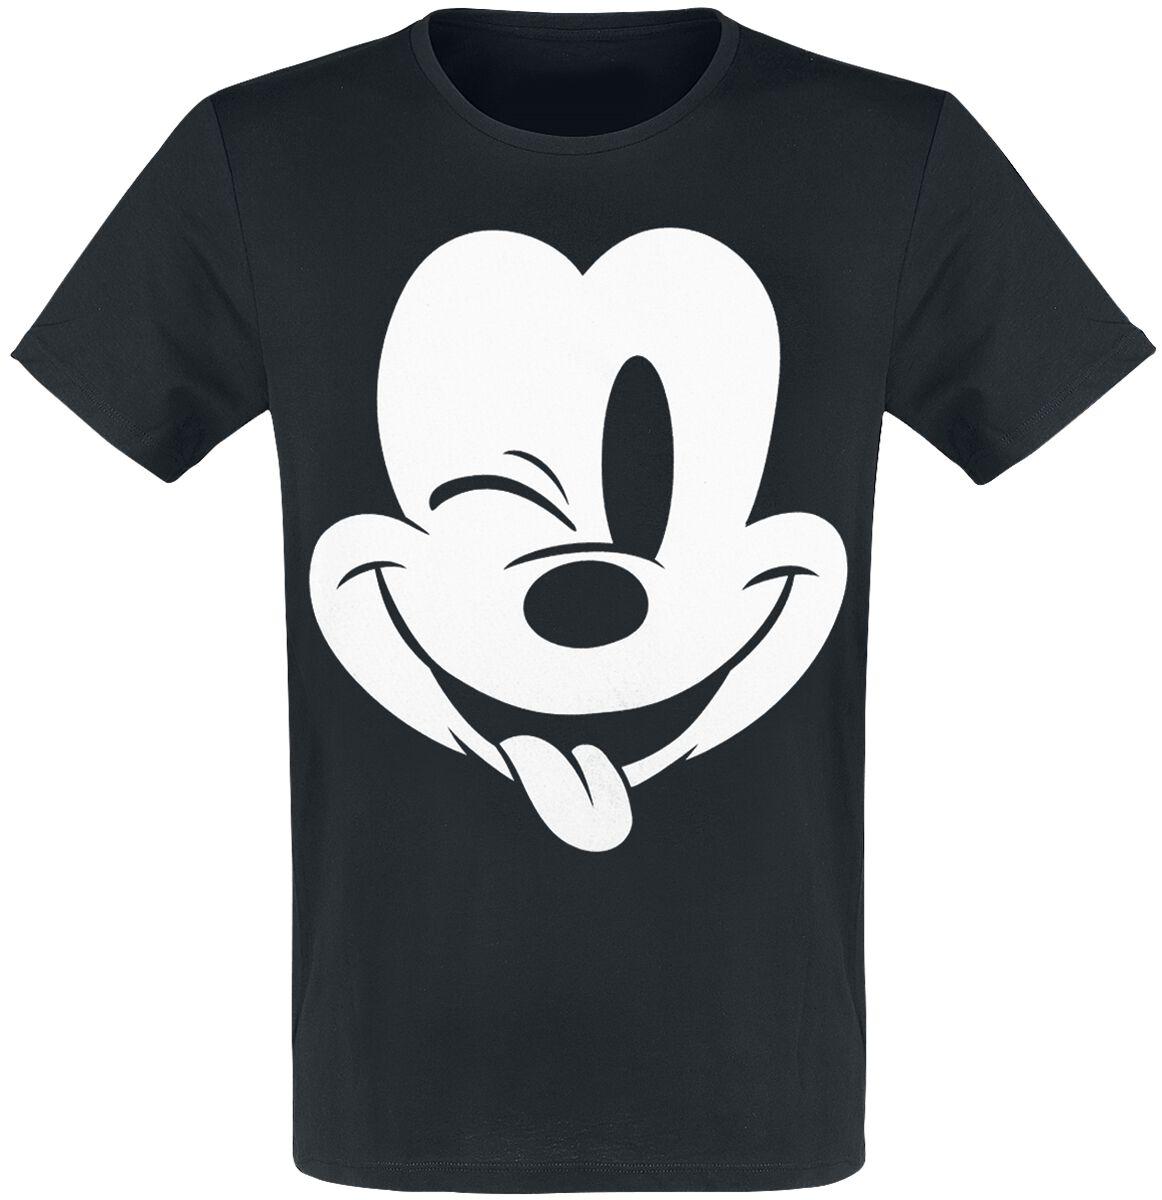 Micky Maus Wink  T-Shirt  schwarz